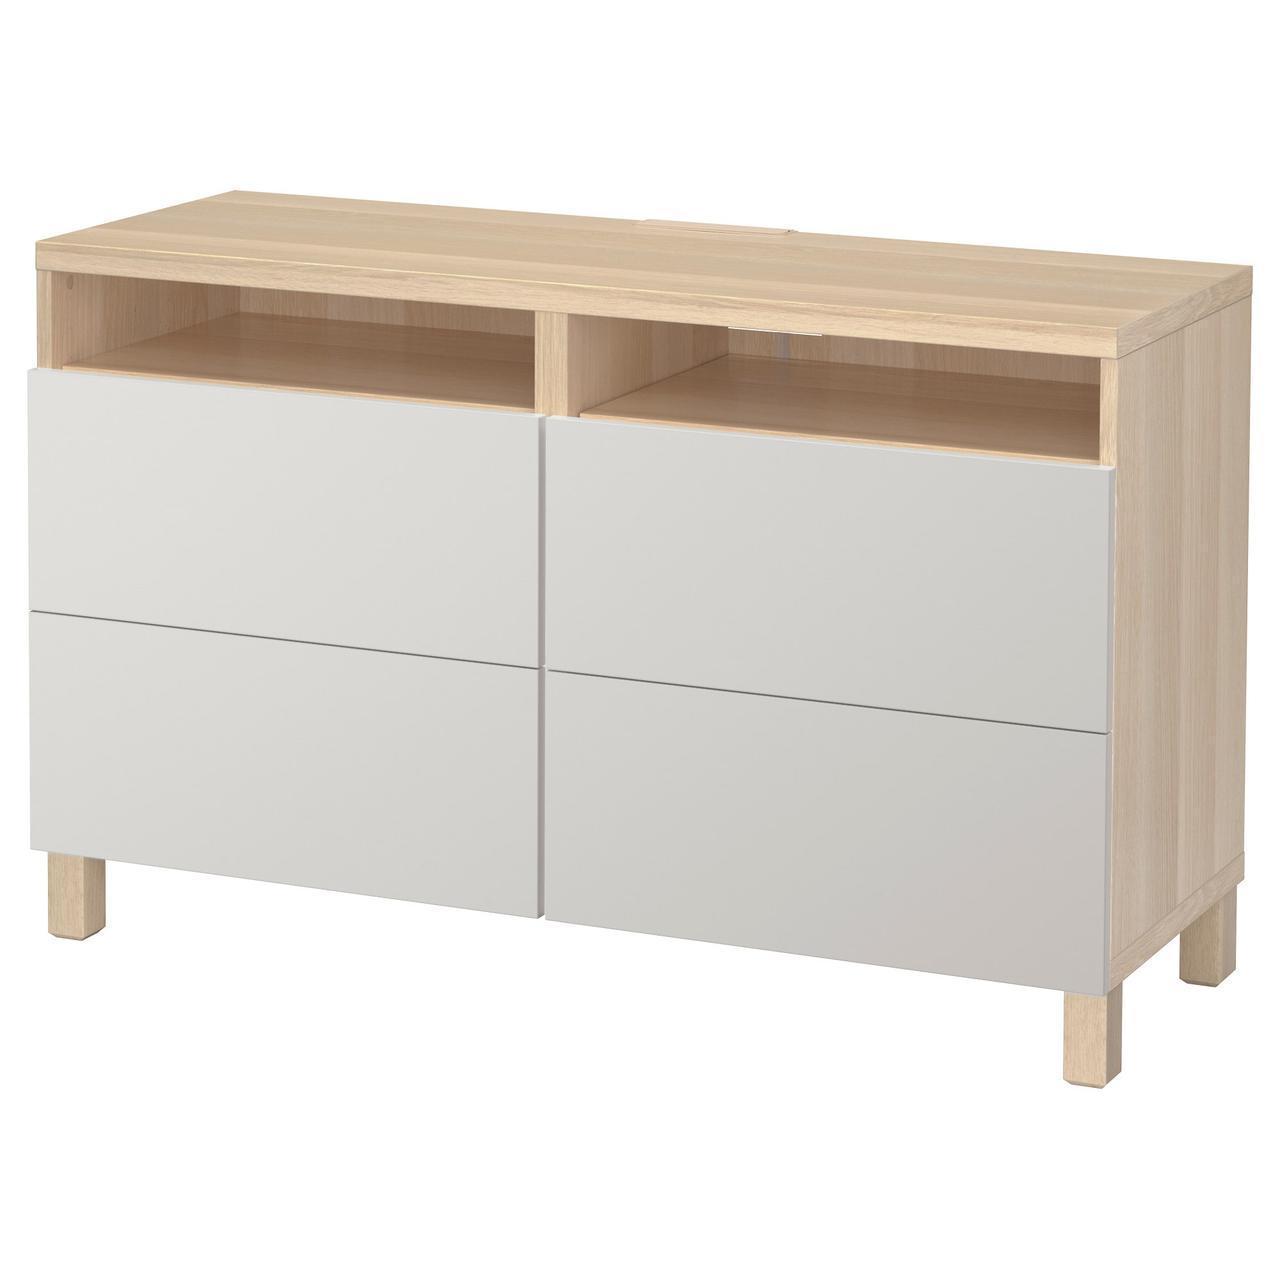 IKEA BESTA Тумба под телевизор с ящиками, белый дуб, Лаппвикен светло-серый  (492.026.24)